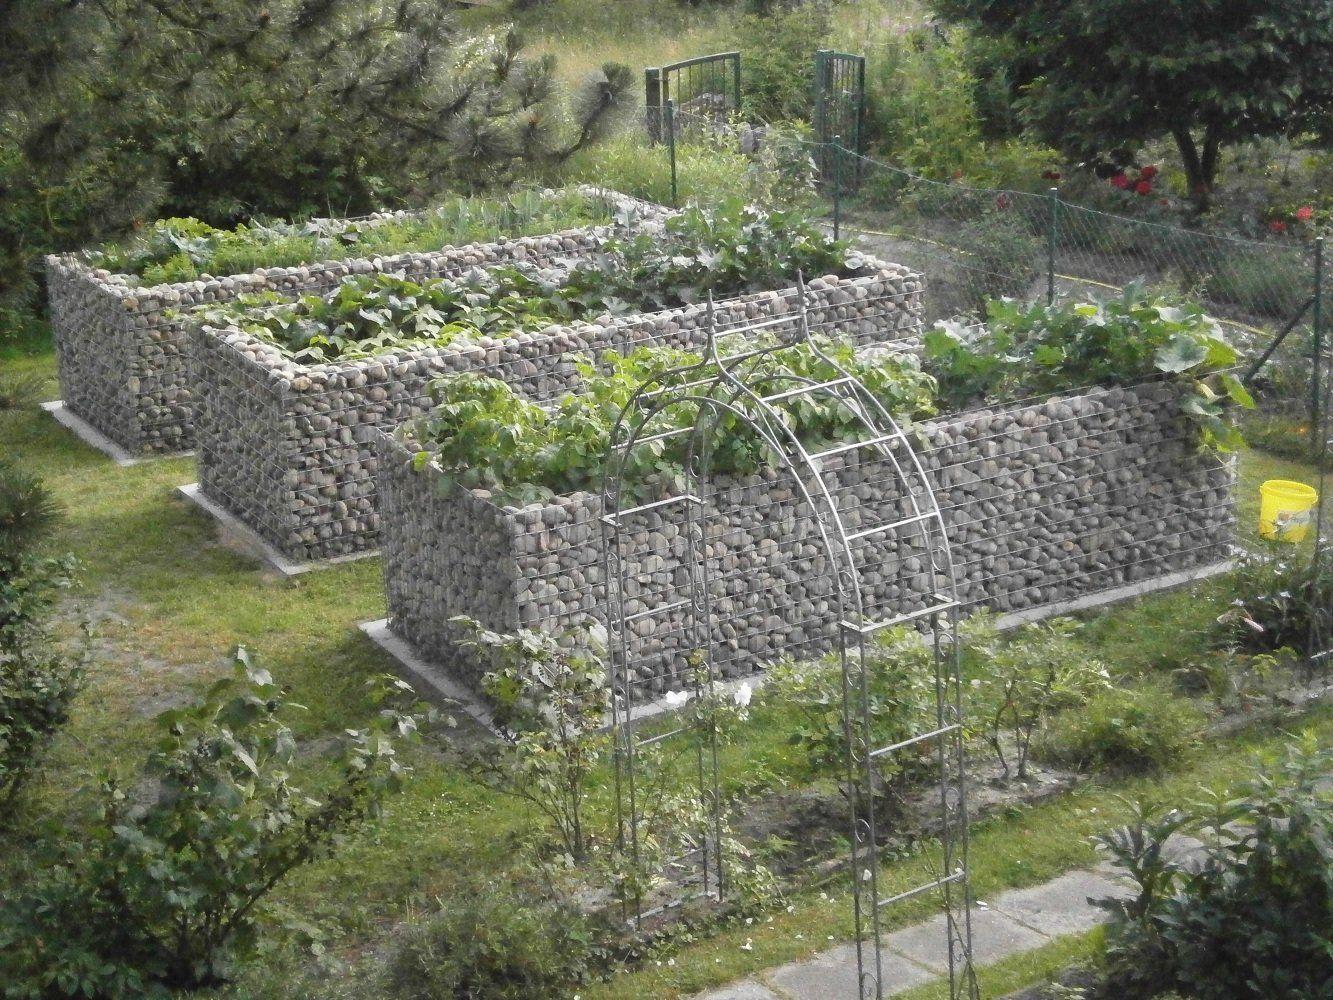 Gabion Basket Raised Fence L 200 X 100 X 100 Cm 5 10 X Mesh Wall 10 Cm Amazon Co Uk Garden Outdoors Gabion Baskets Fence Outdoor